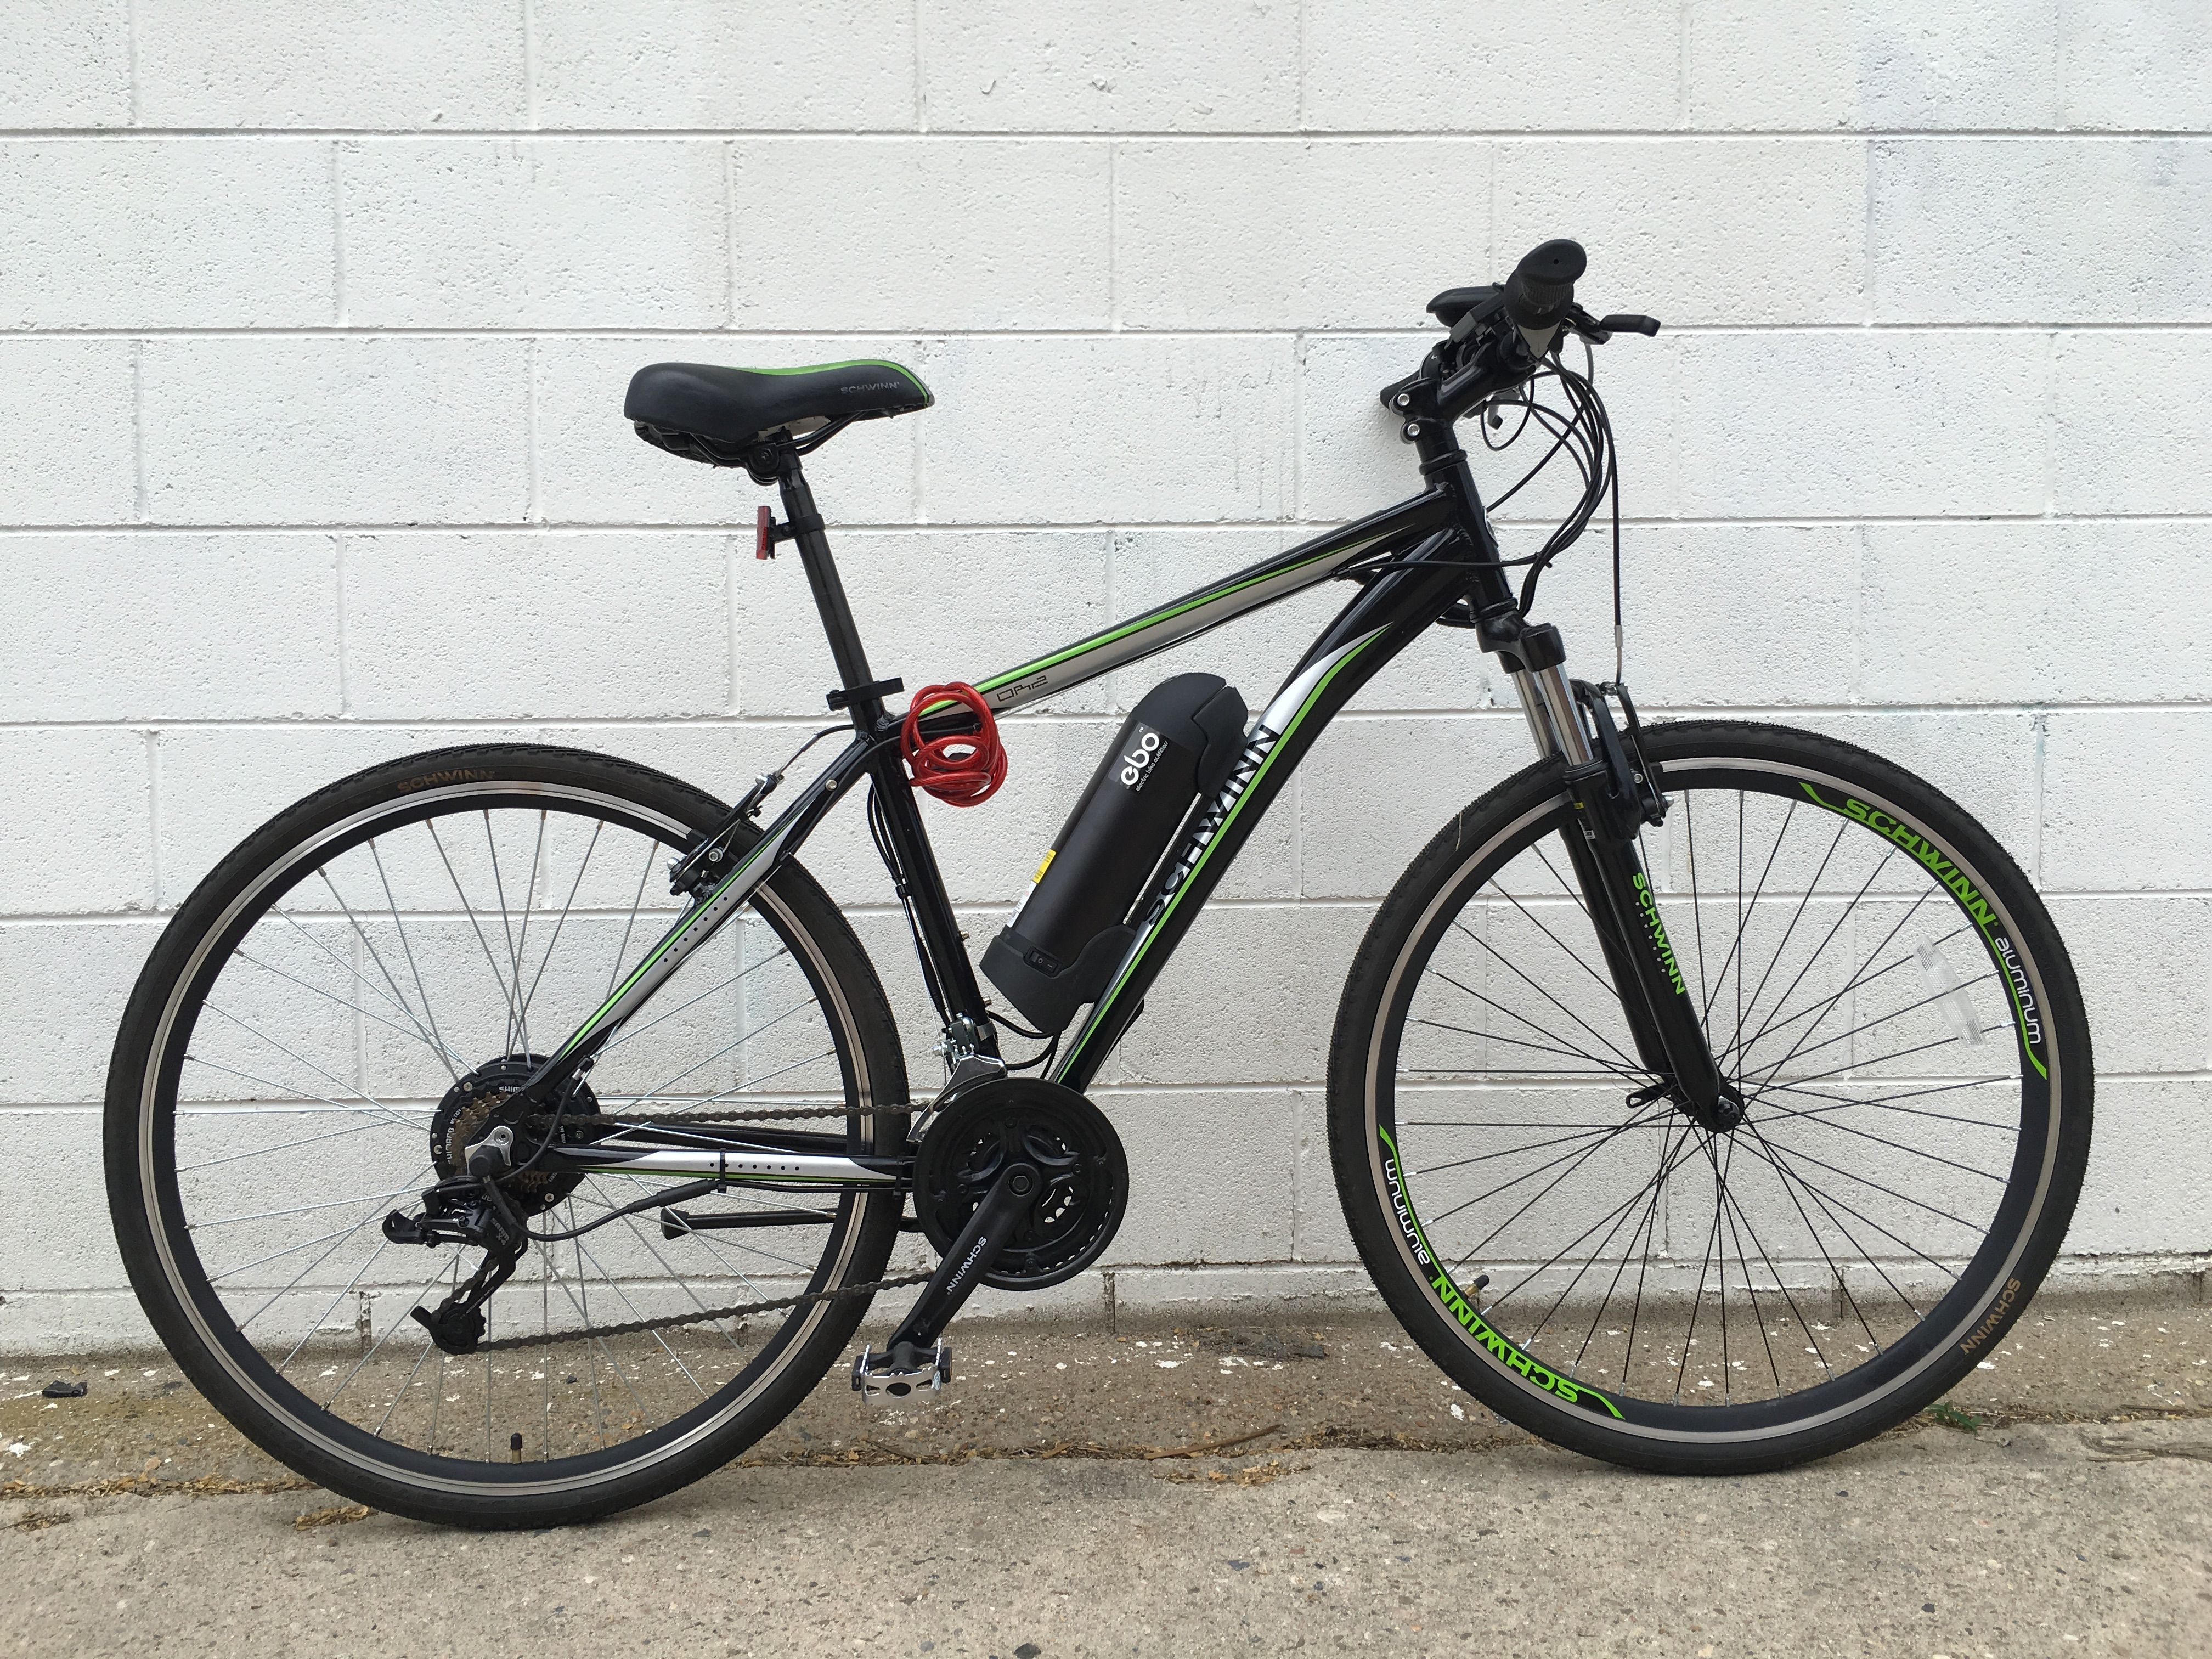 EBO Phantom electric bike kit installed on a Schwinn OR2